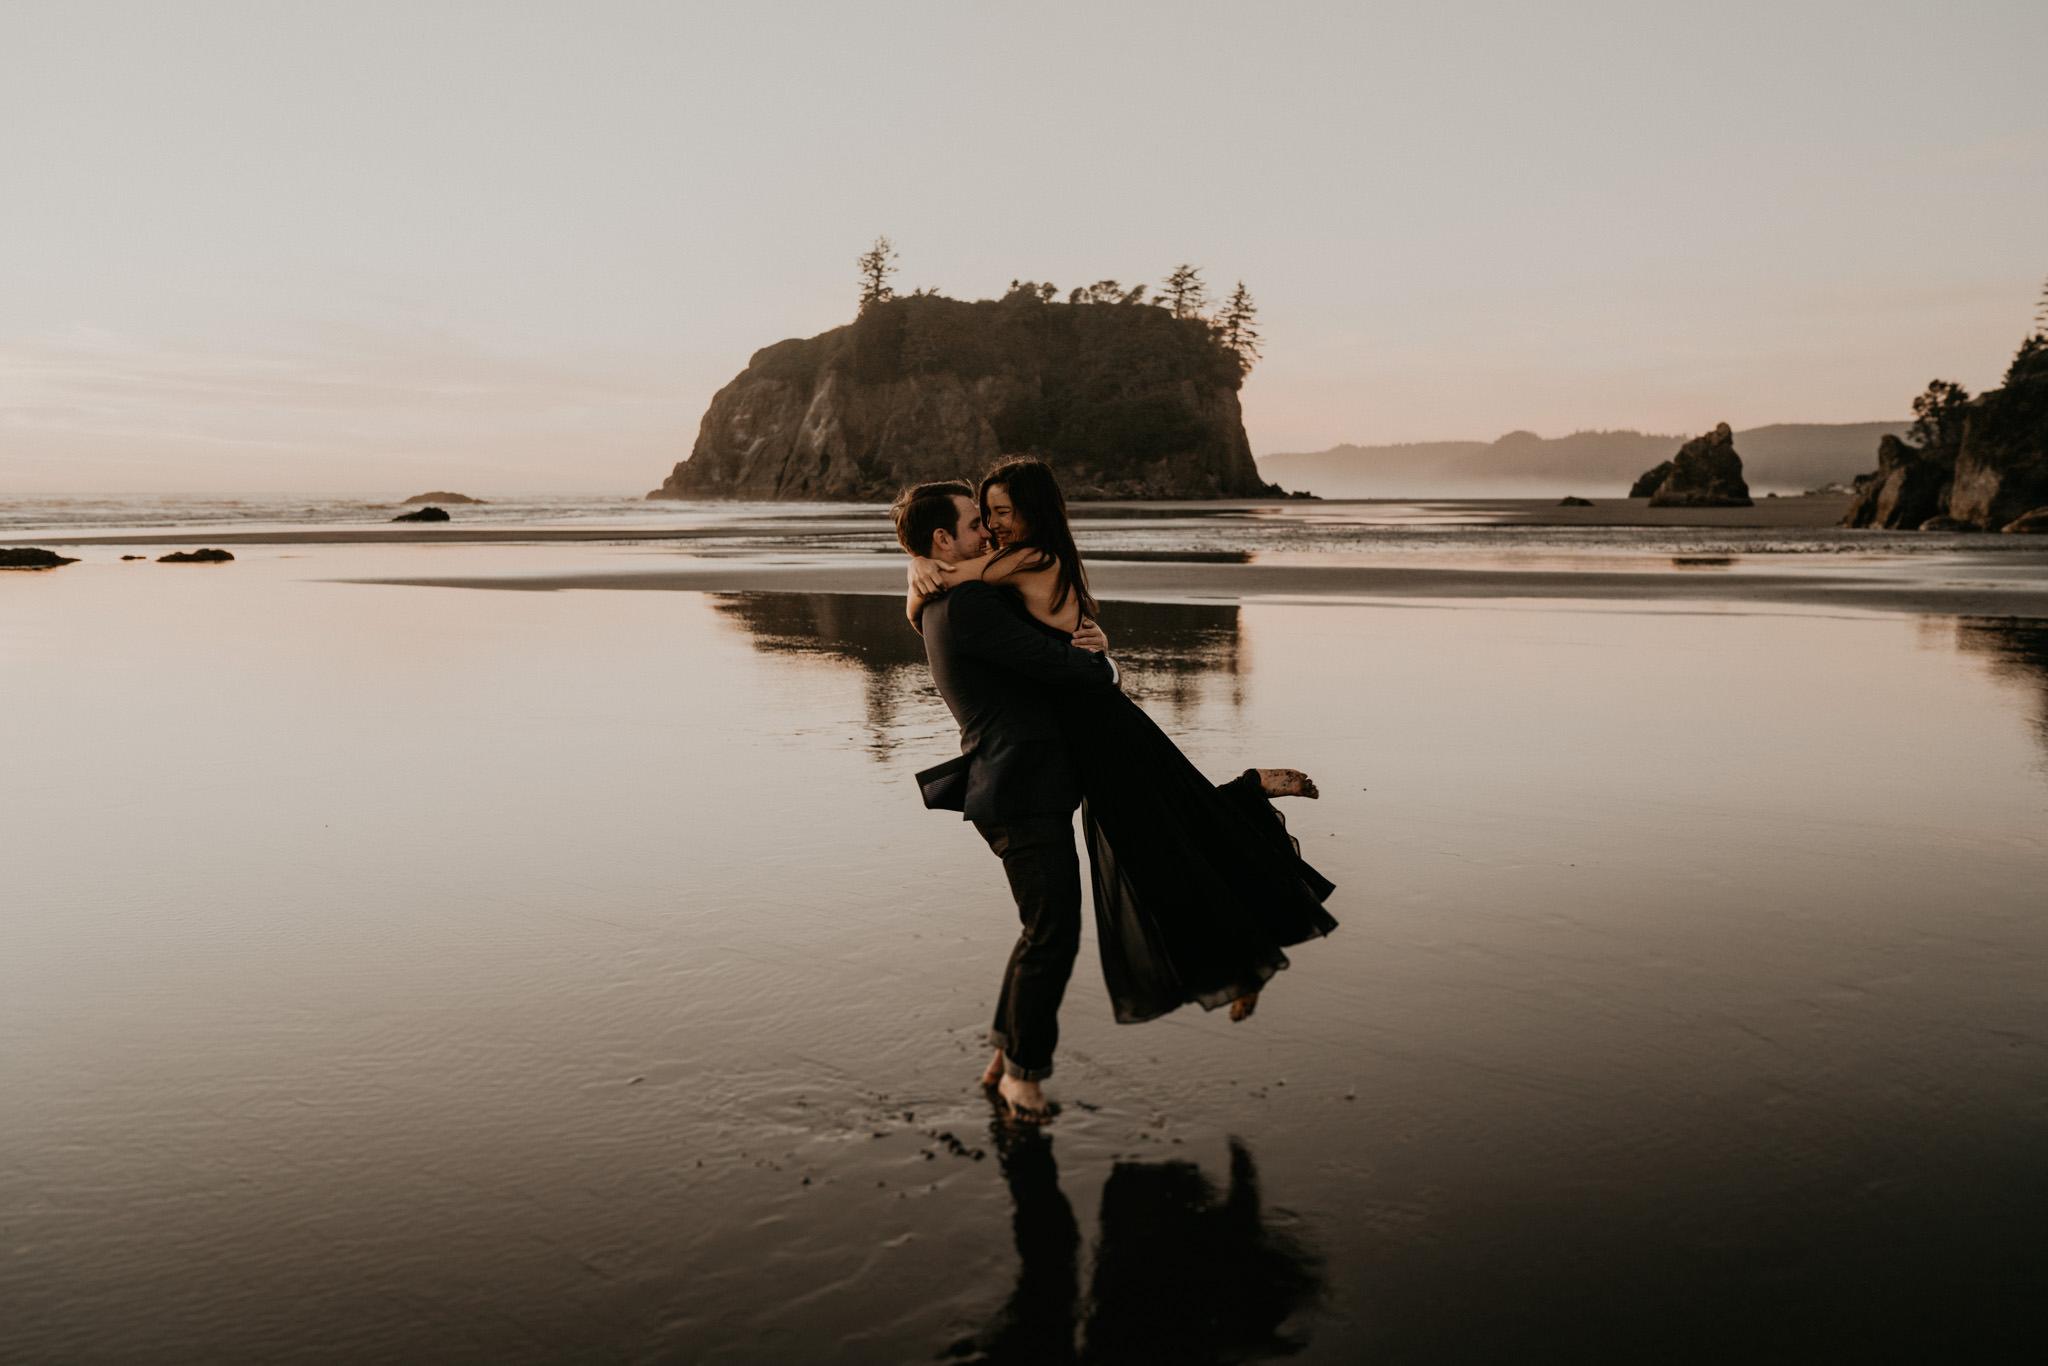 ruby-beach-la-push-rialto-washington-coast-olympic-peninsula-national-park-seattle-wedding-photographer-henrysdiary-henry-tieu-hey-darling-workshop-hdpresets-hd-presets-3.jpg